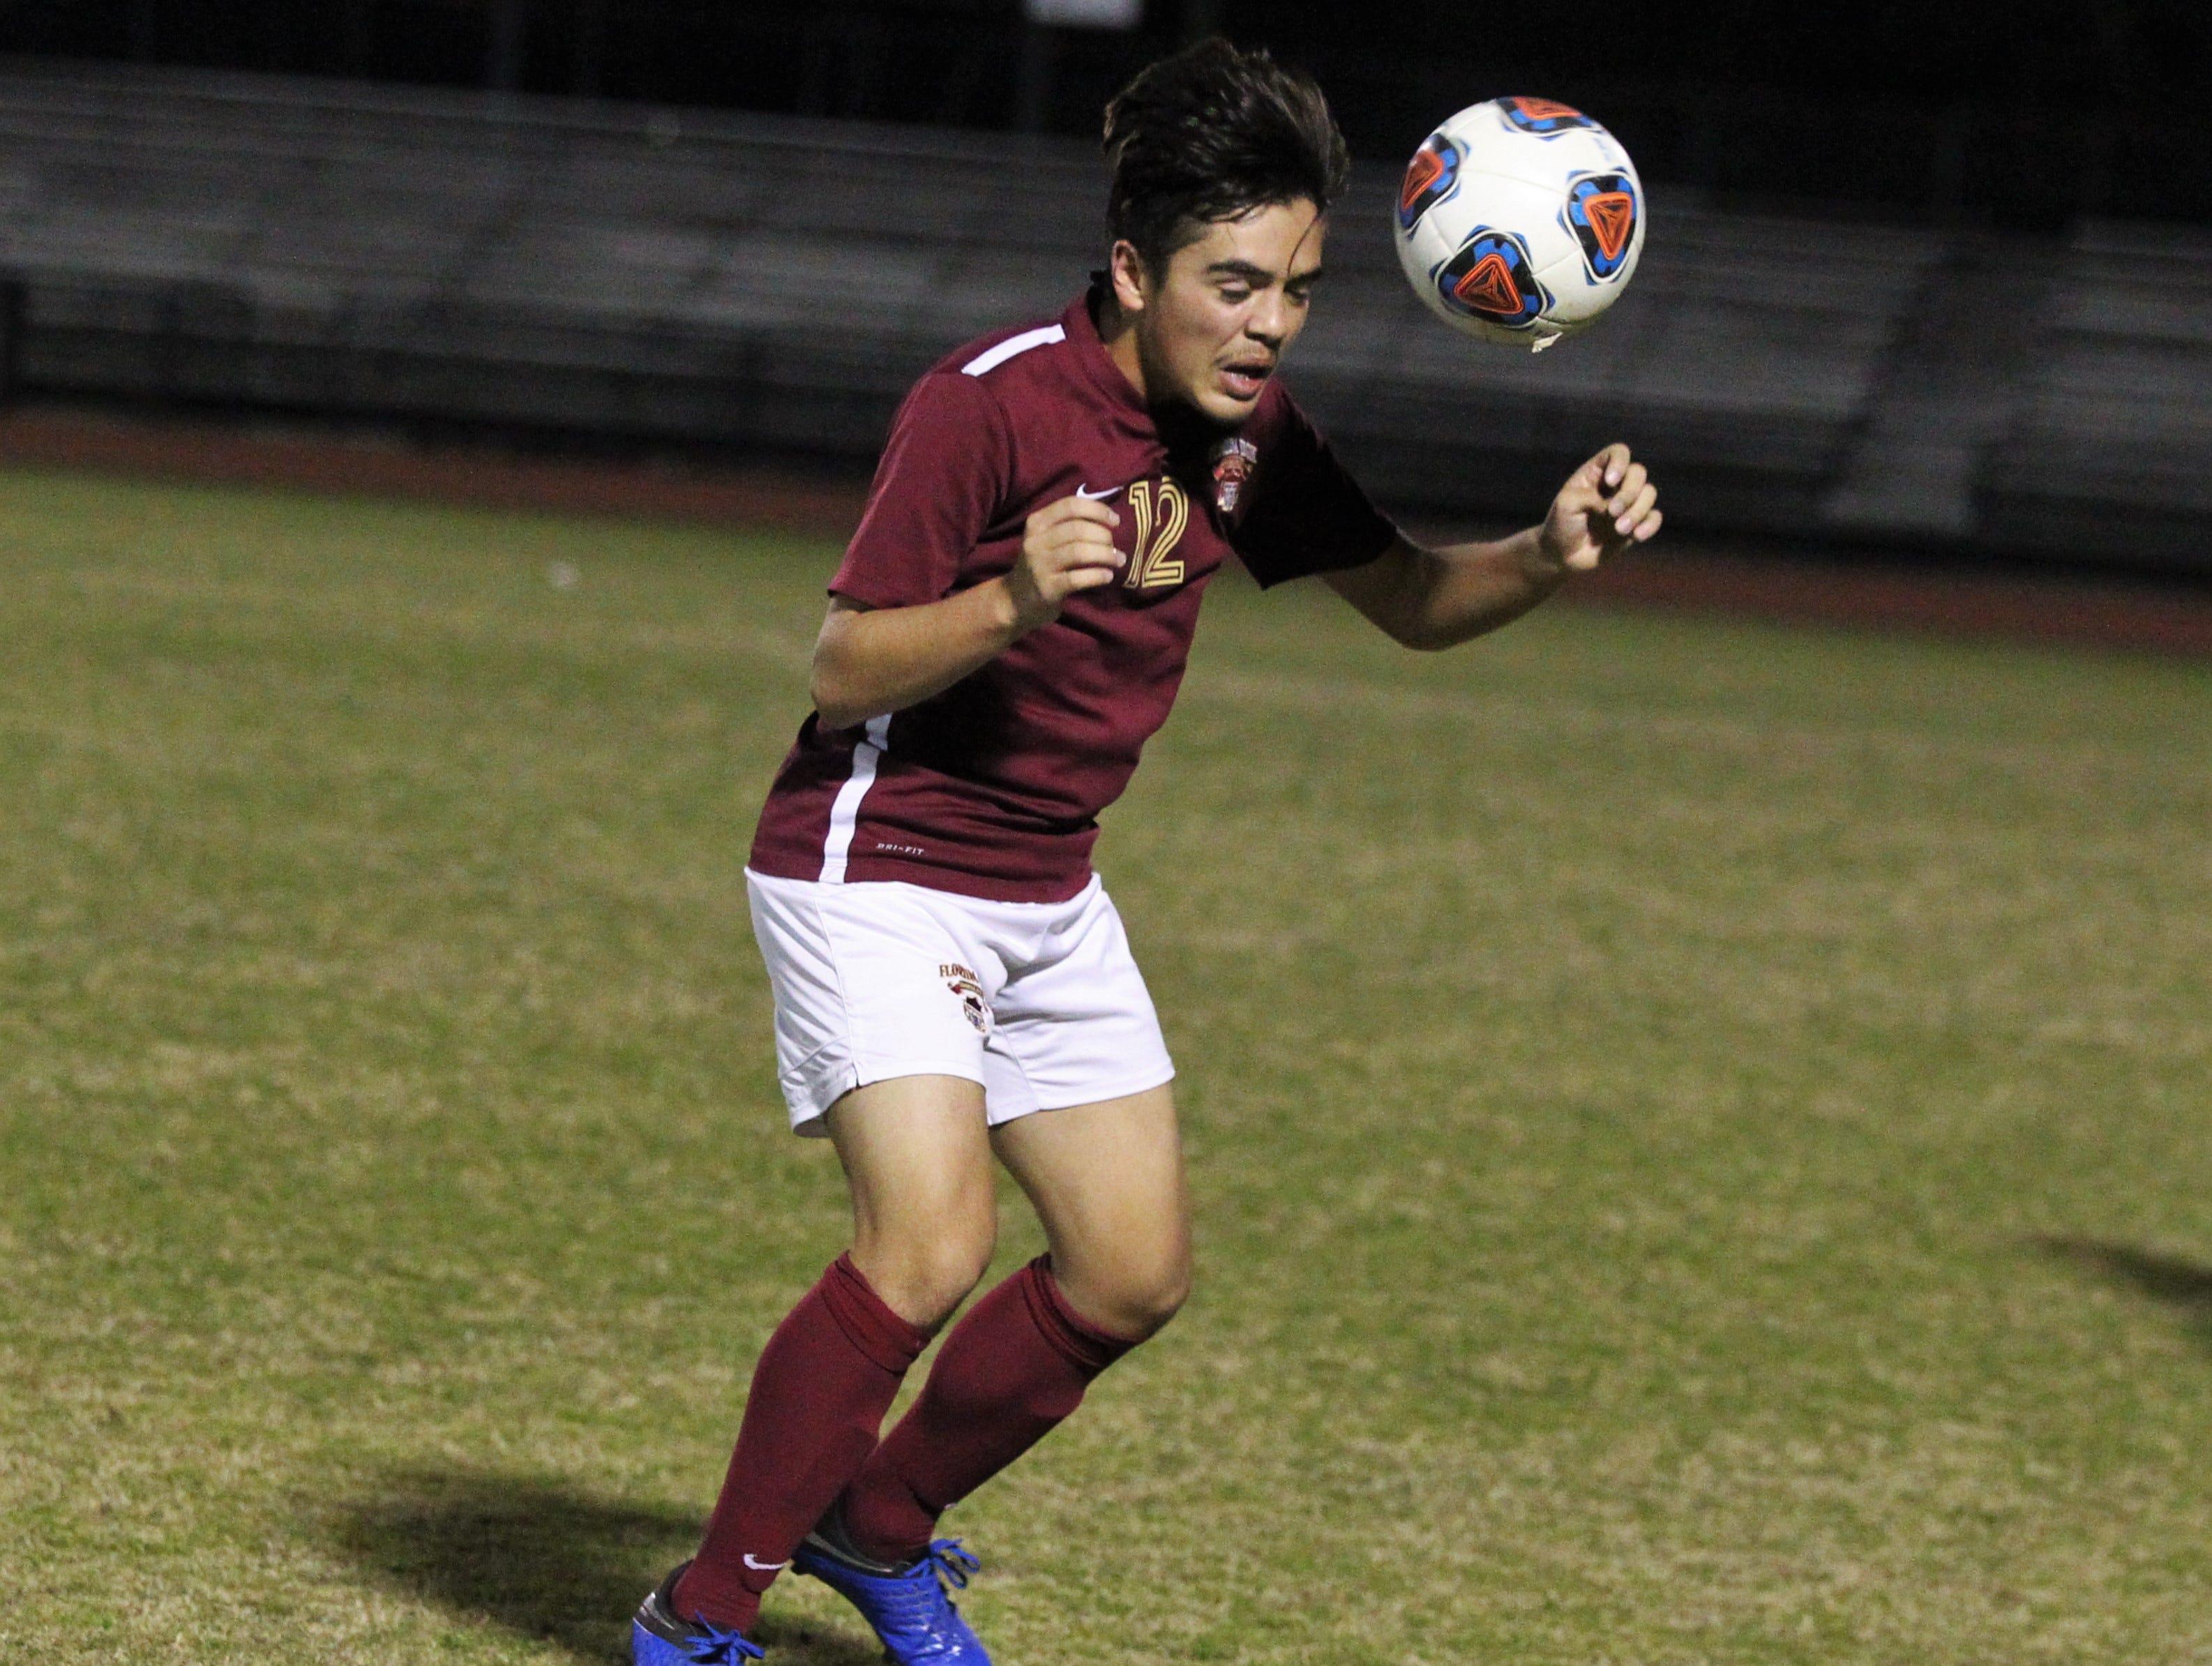 Florida High's Josh Limburg heads a ball forward as Florida High's boys soccer team beat South Walton 2-0 during a Region 1-2A quarterfinal on Feb. 6, 2018.